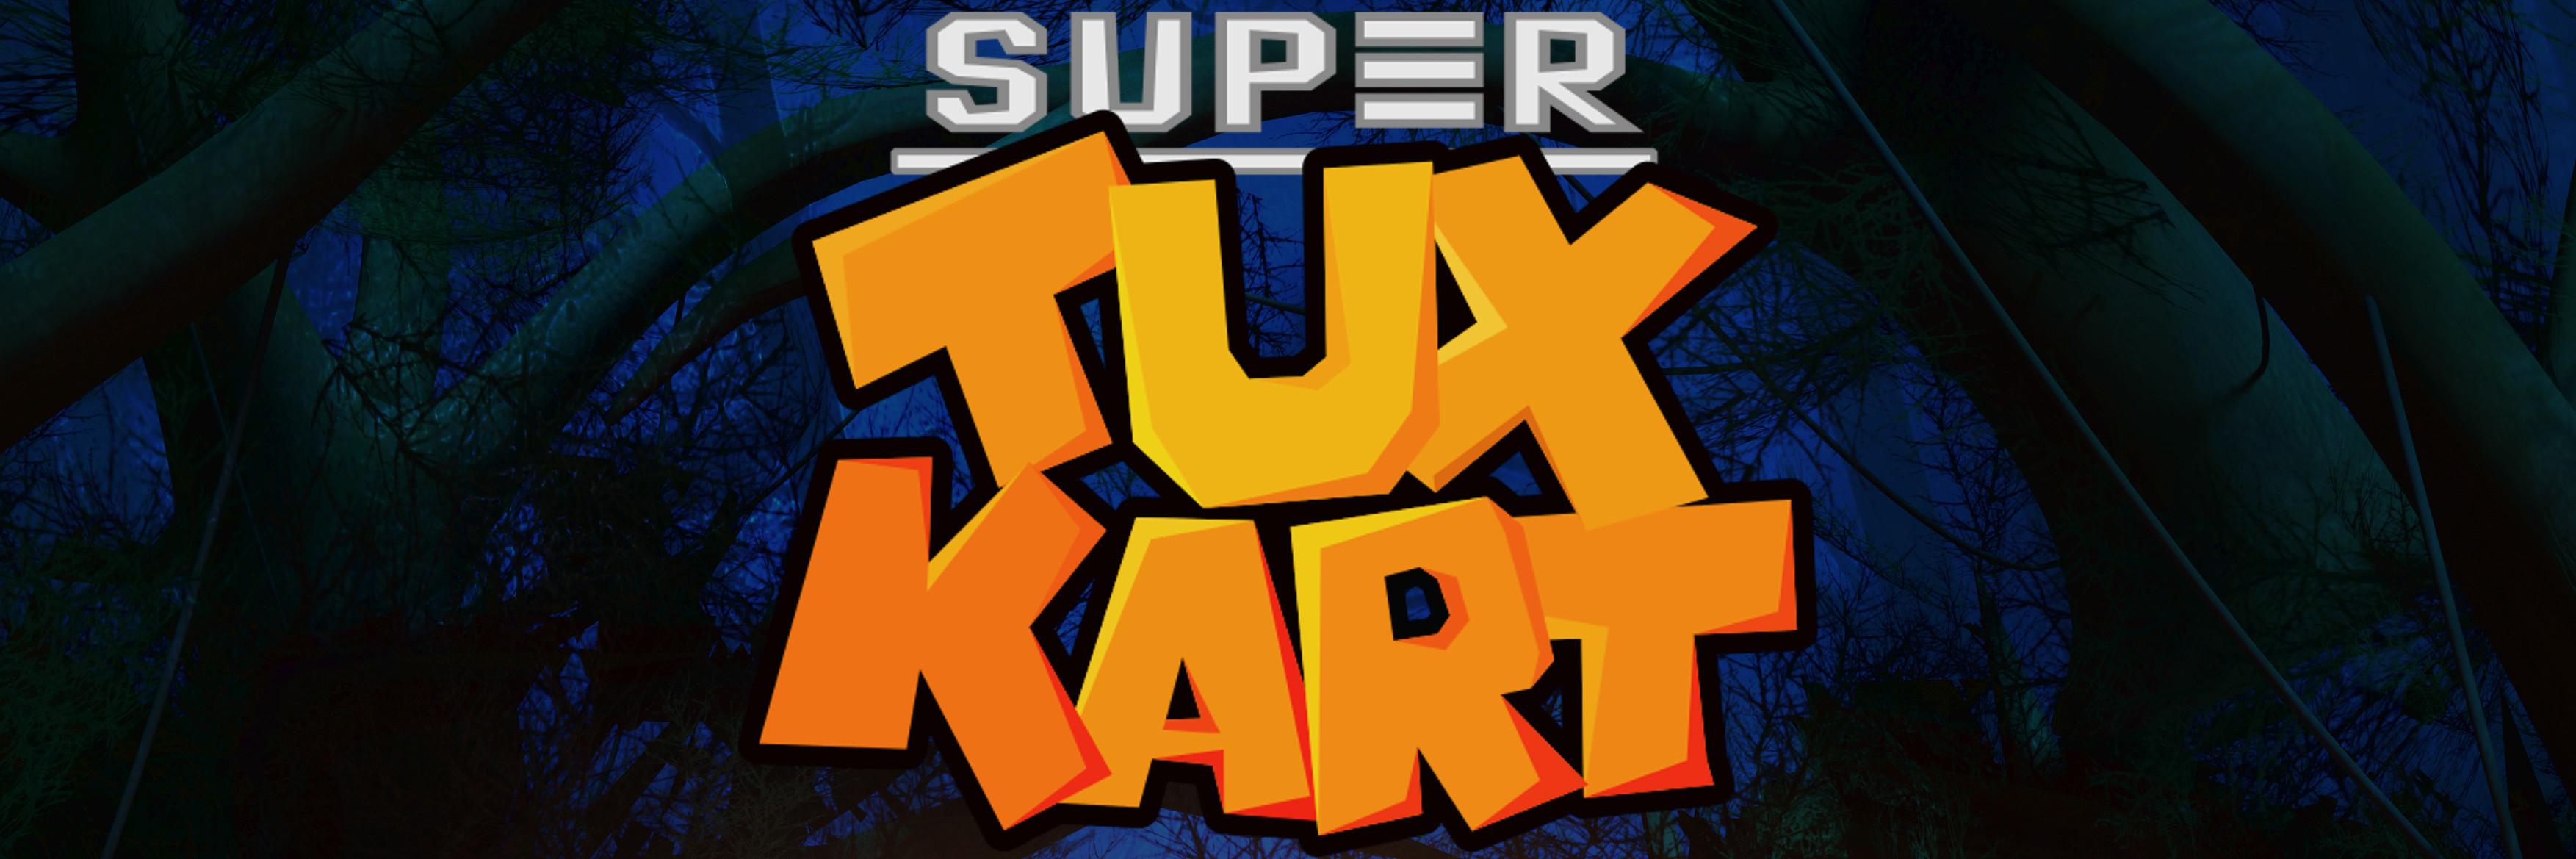 SuperTuxKart banner